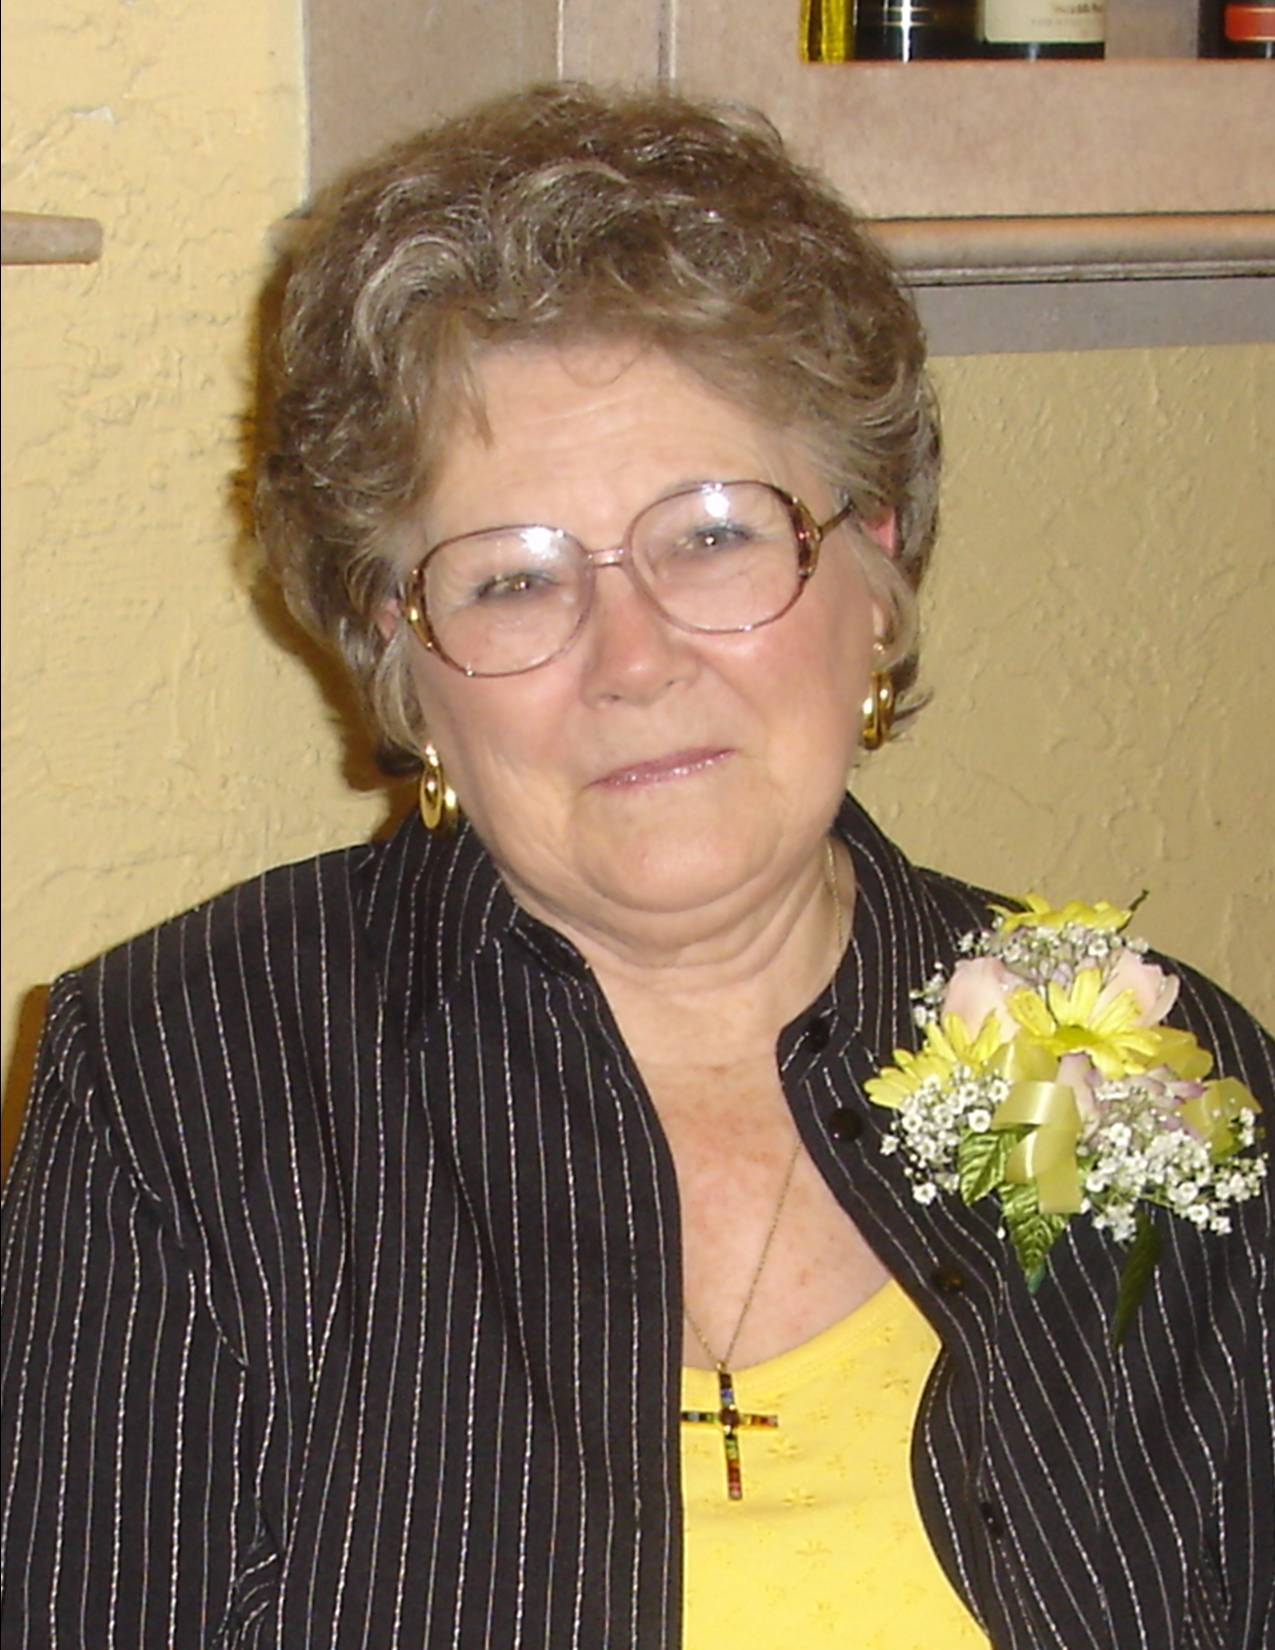 Leona M. Doyle